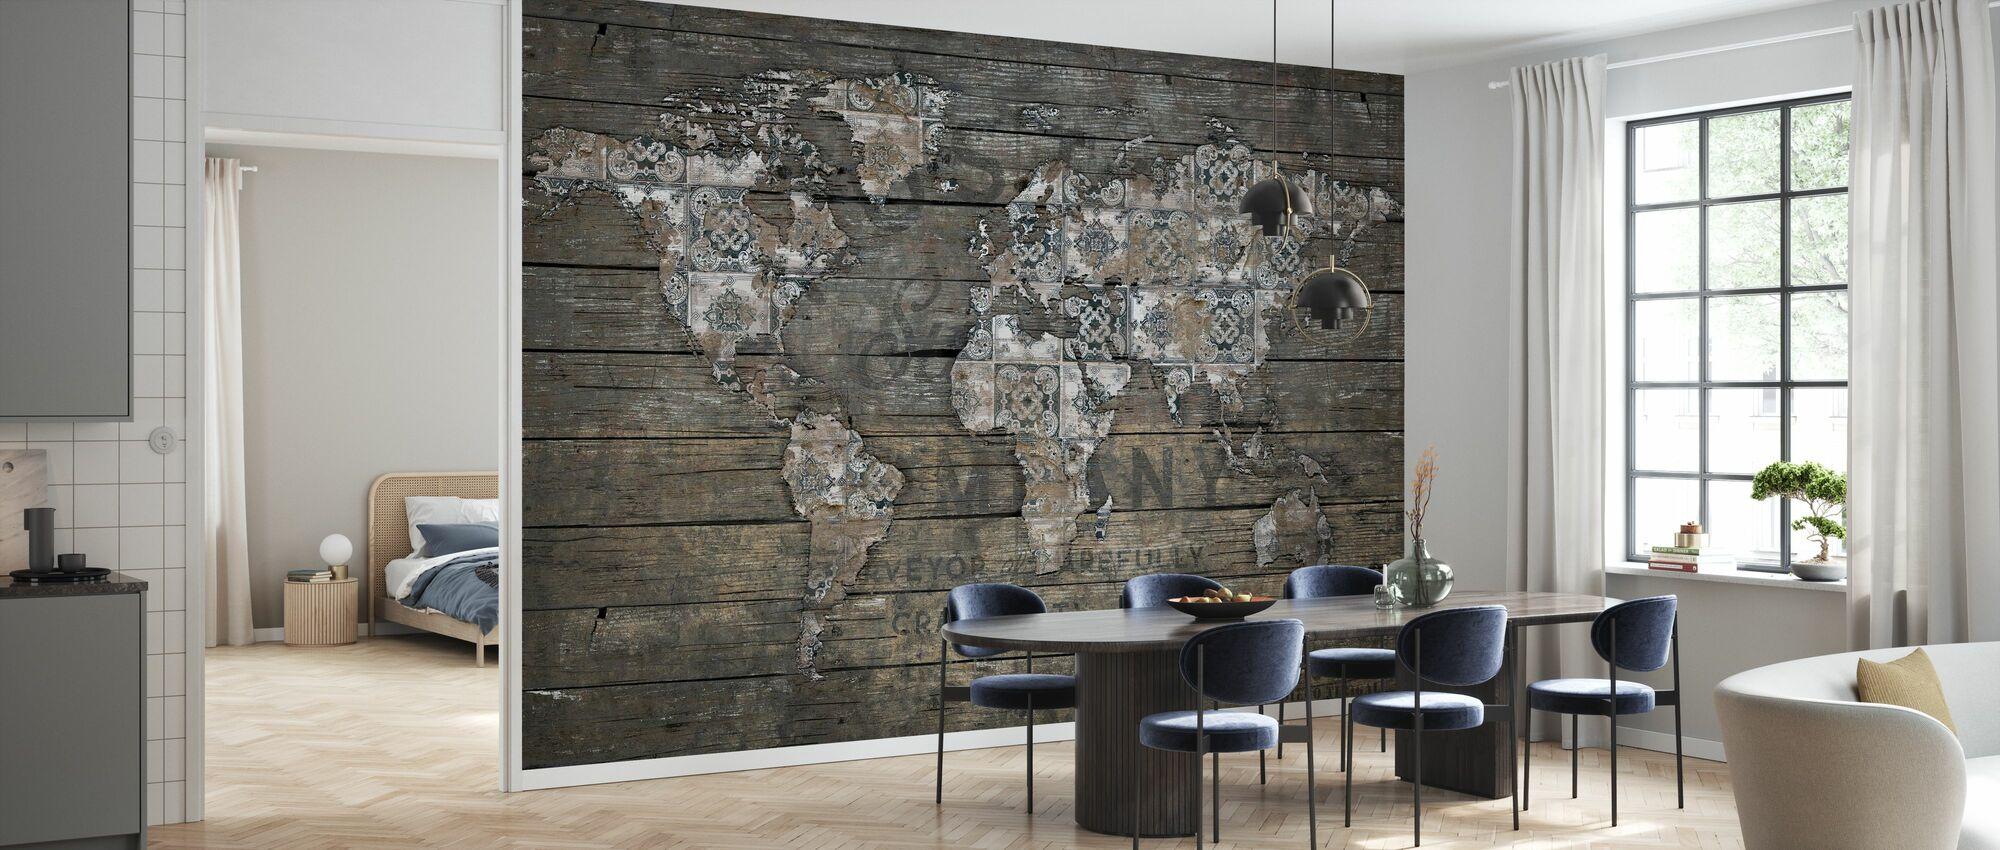 Rustic World Map - Wallpaper - Kitchen